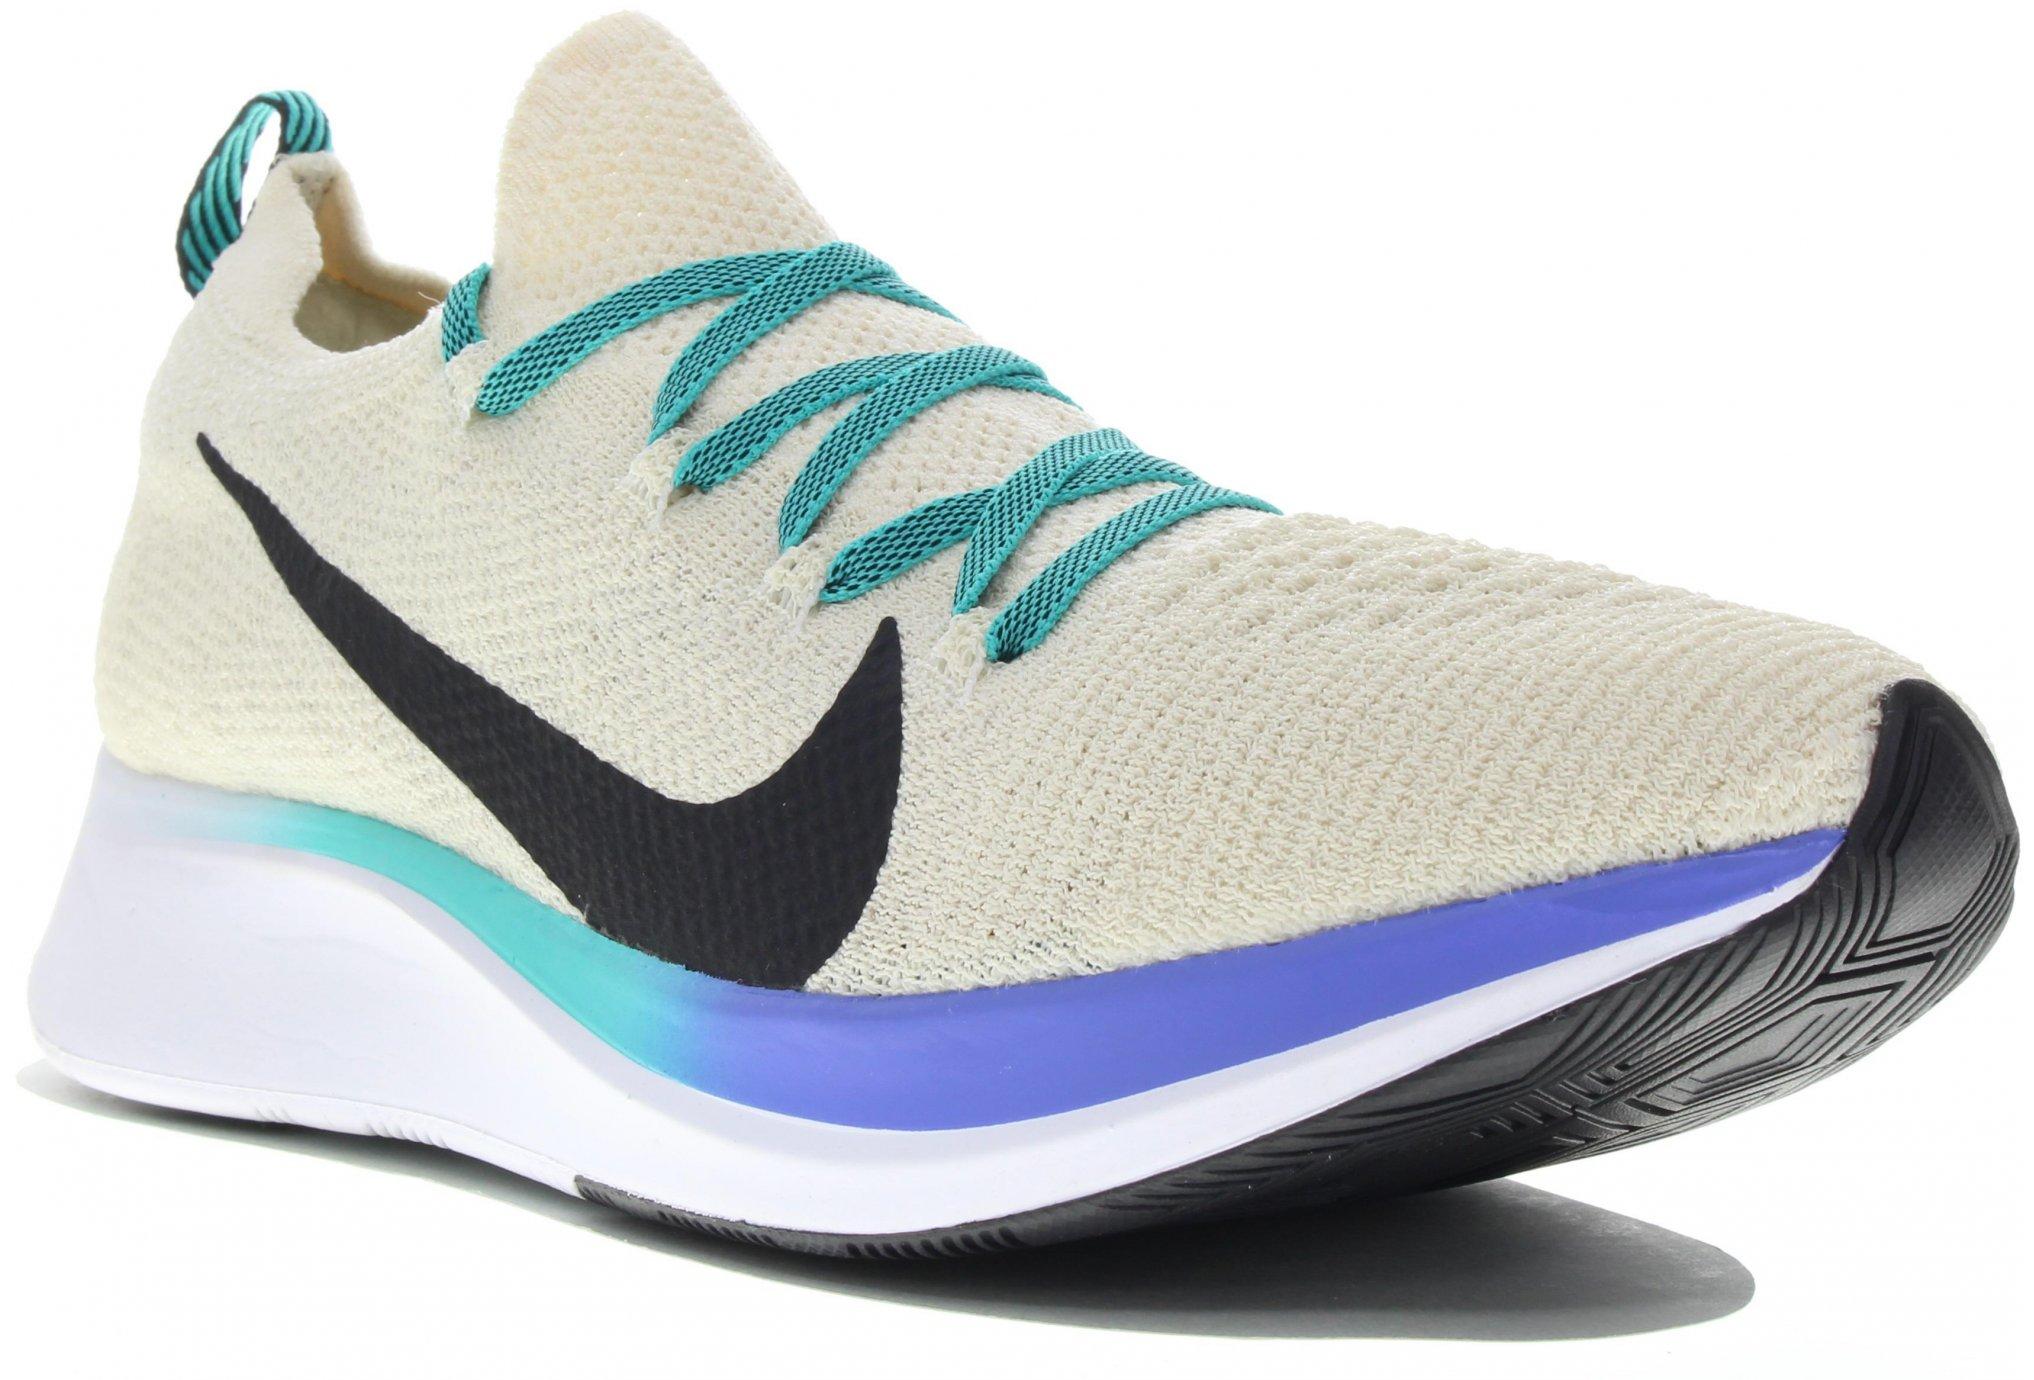 Nike Zoom Fly Flyknit W Diététique Chaussures femme